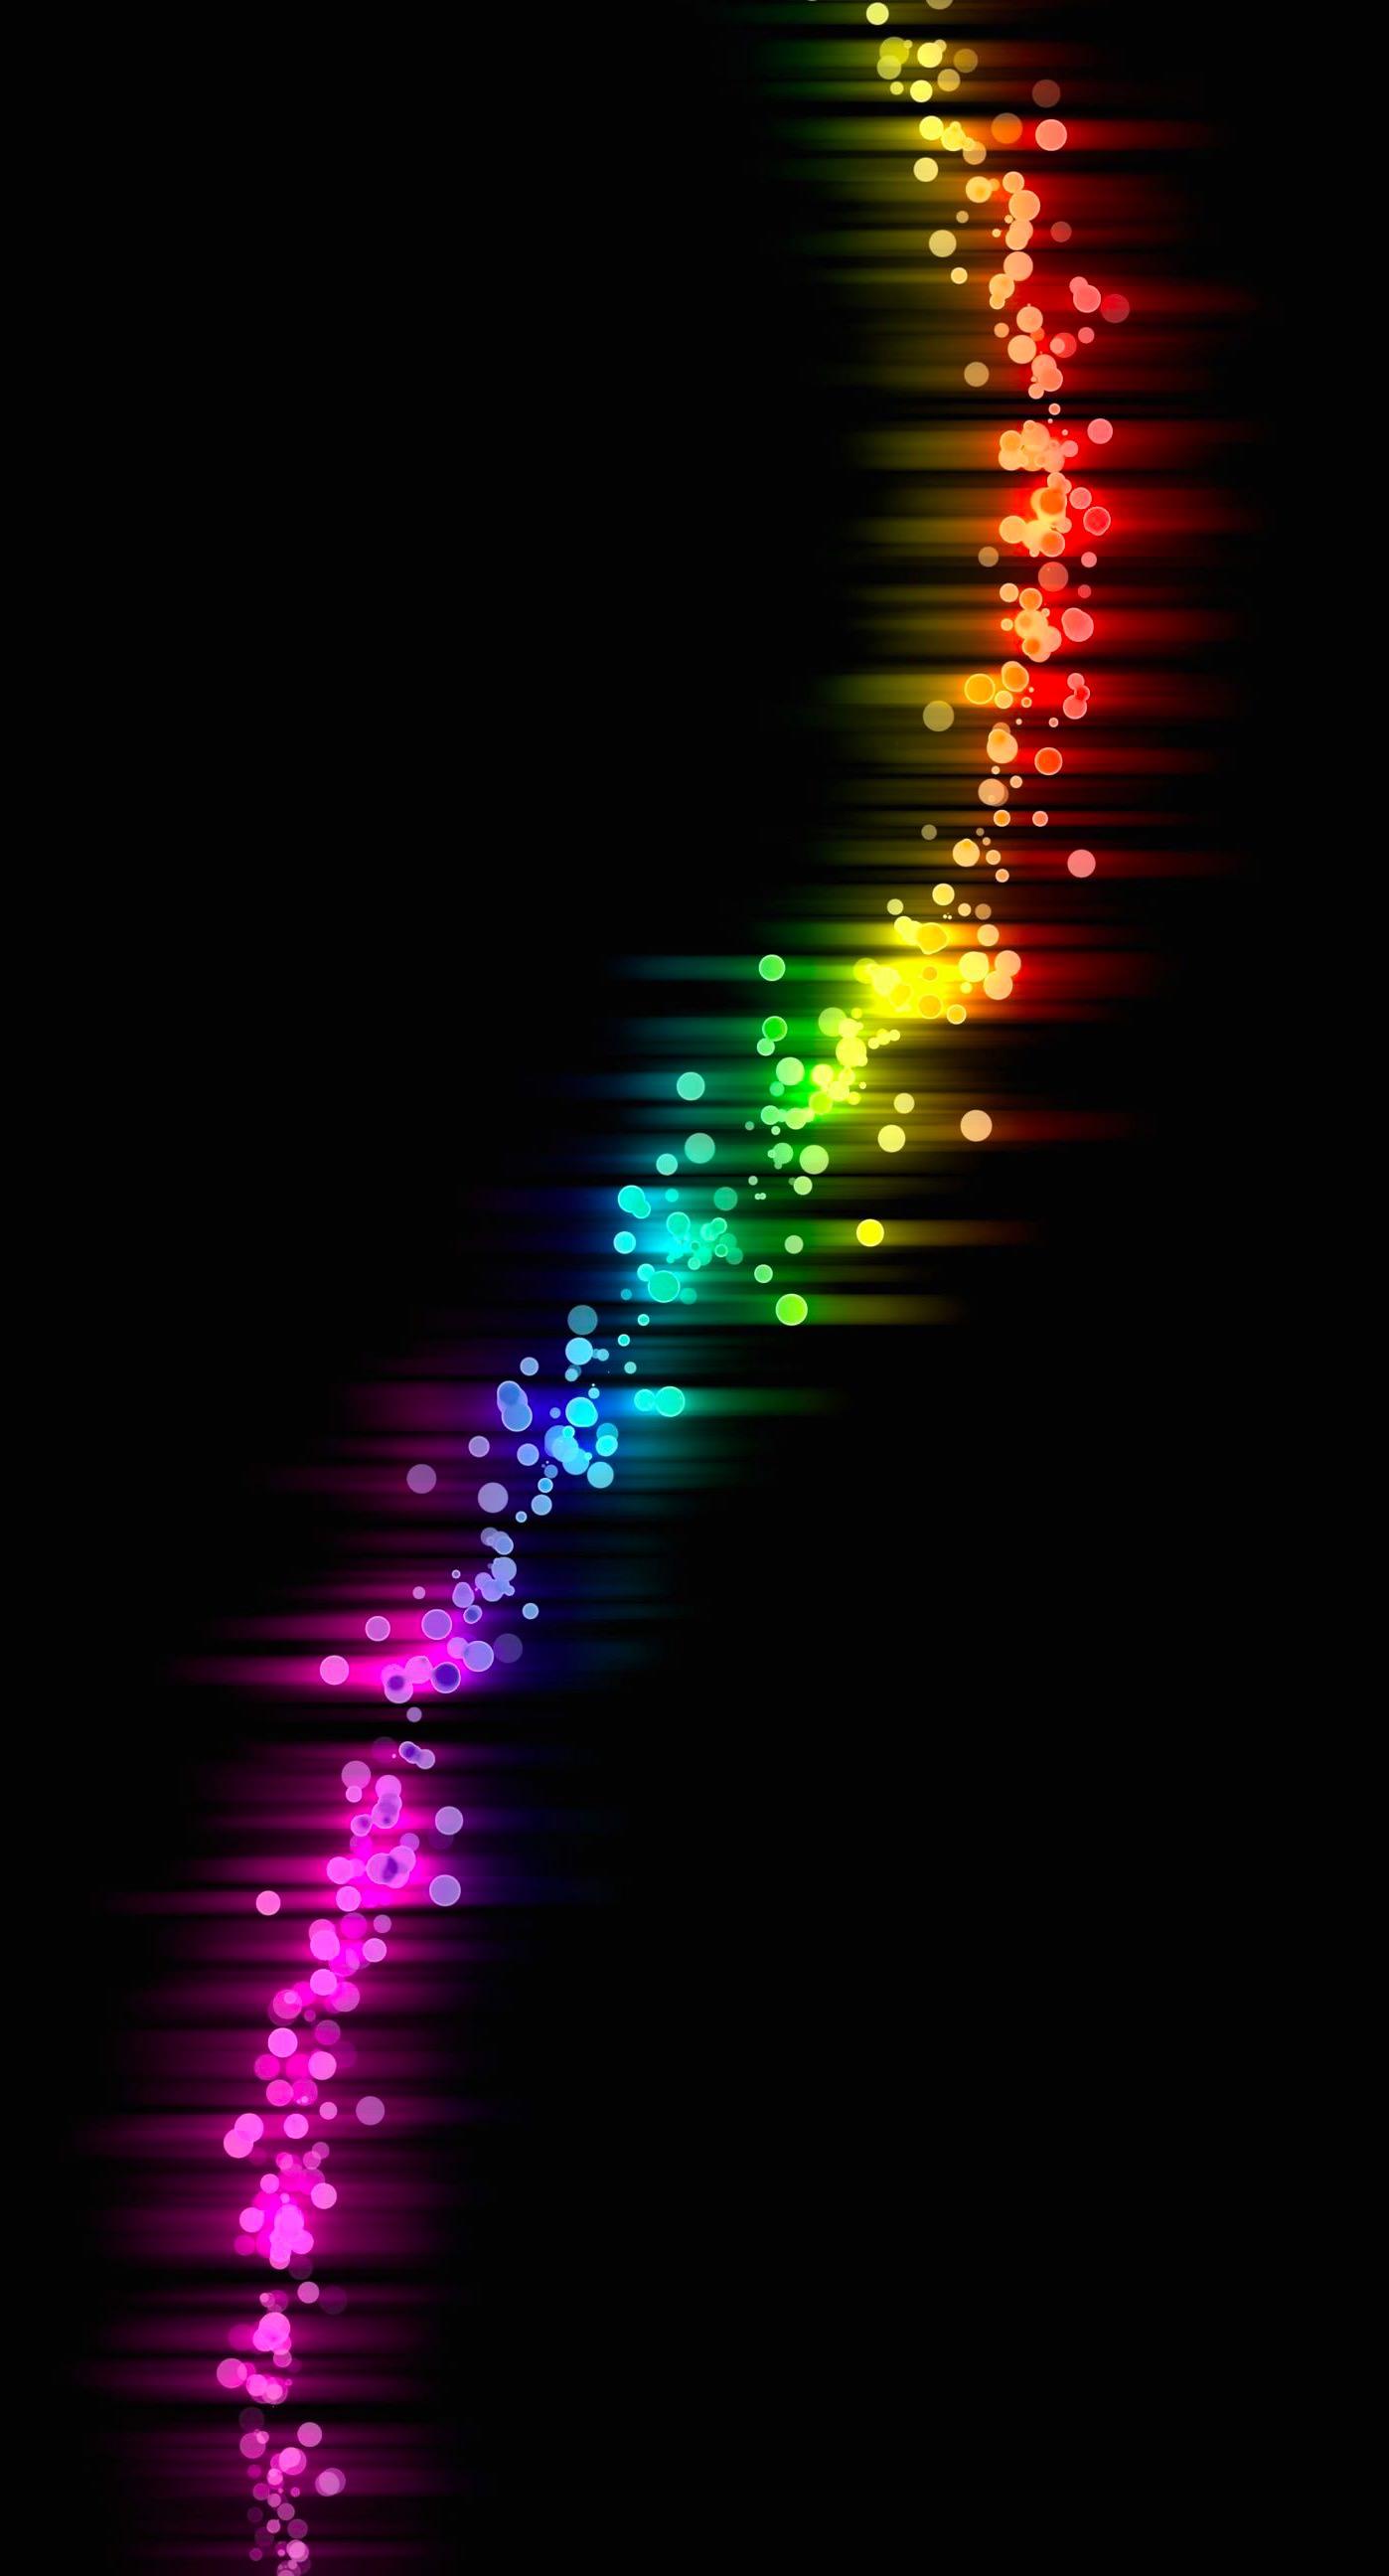 Colorful Rainbow Pattern Black Cool Wallpaper Sc Iphone6splus